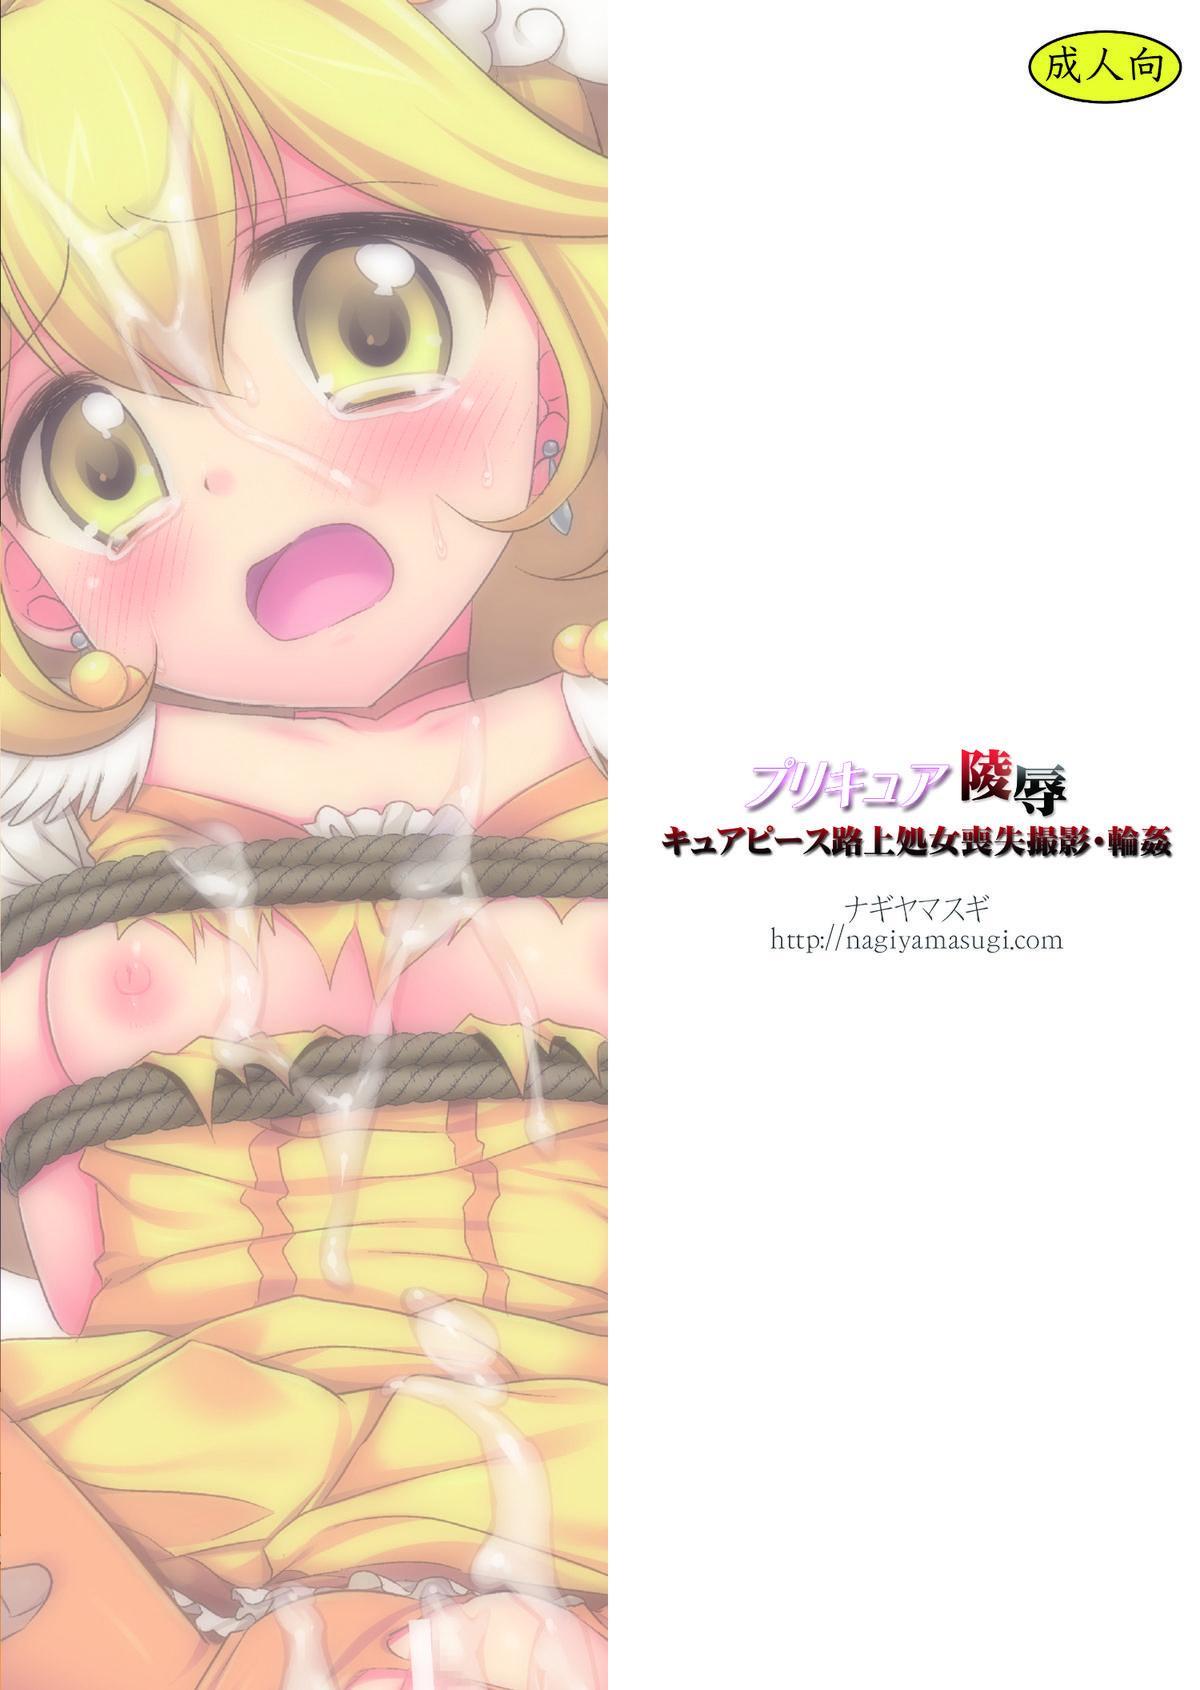 Precure Ryoujoku - Cure Peace Rojou Shojo Soushitsu Satsuei Rinkan 21